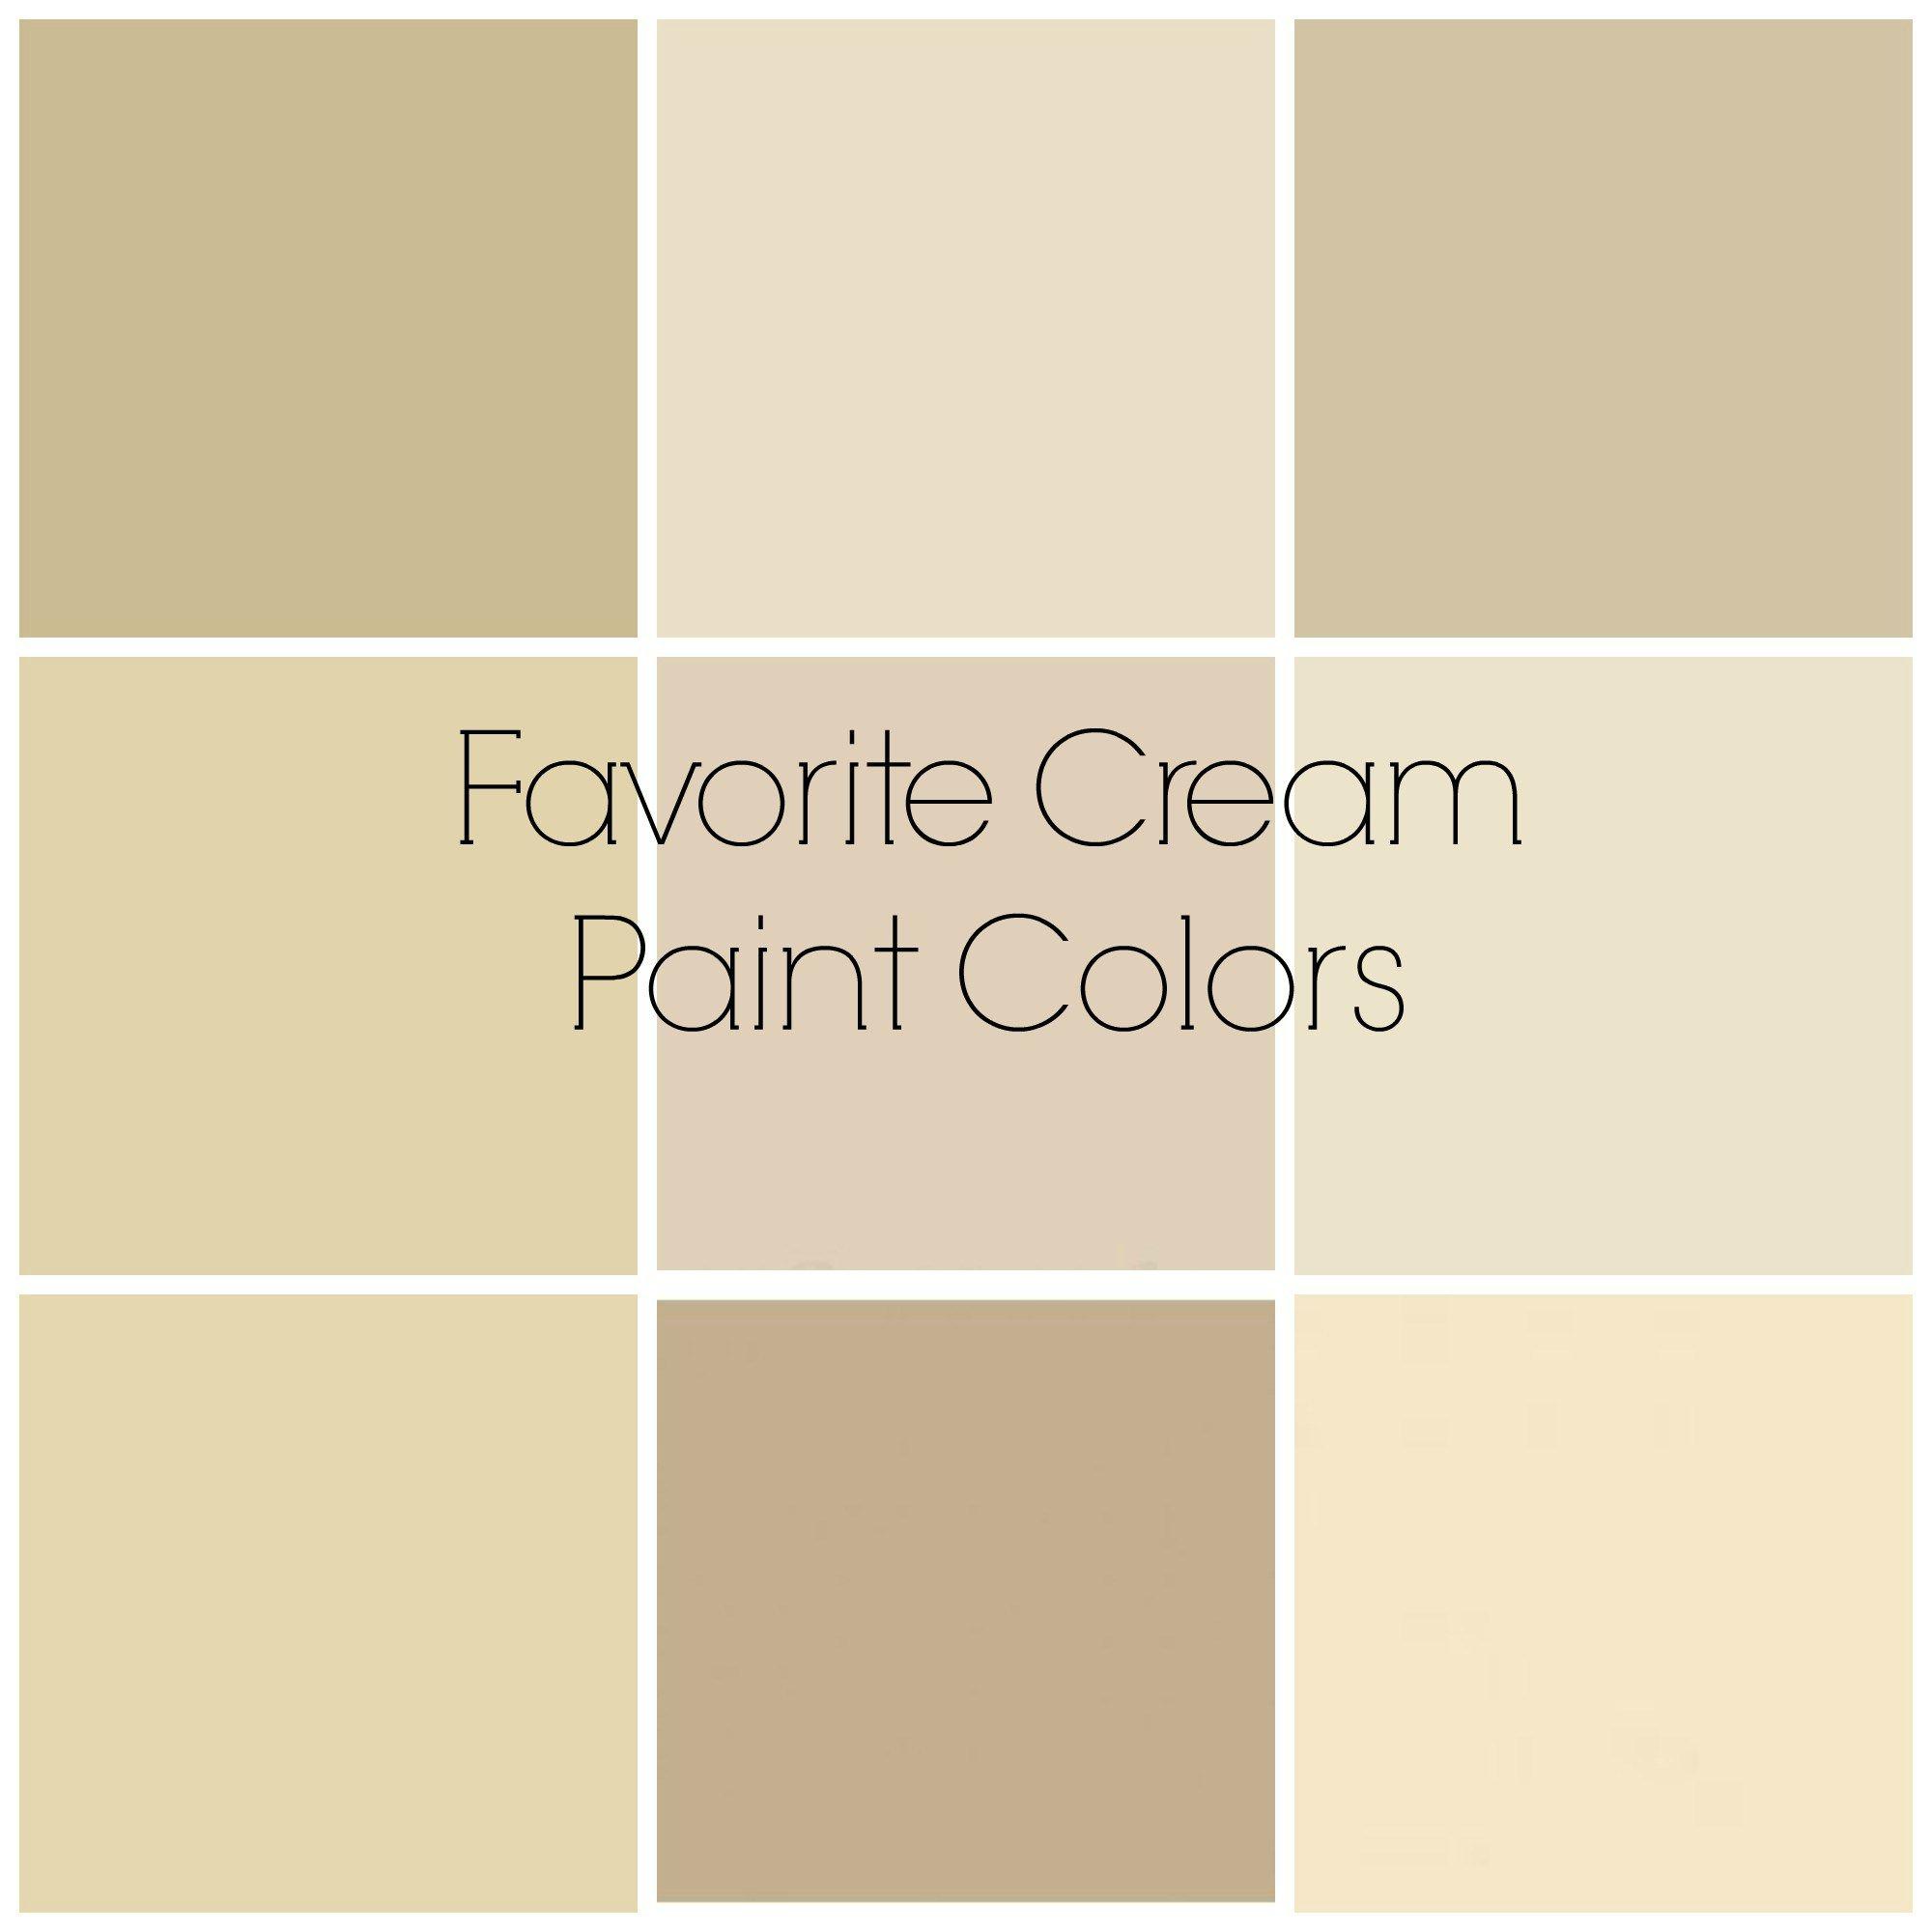 Favorite Cream Paint Colors Ide Cat Kamar Tidur Contoh Warna Cat Warna Cat Cream room paint color